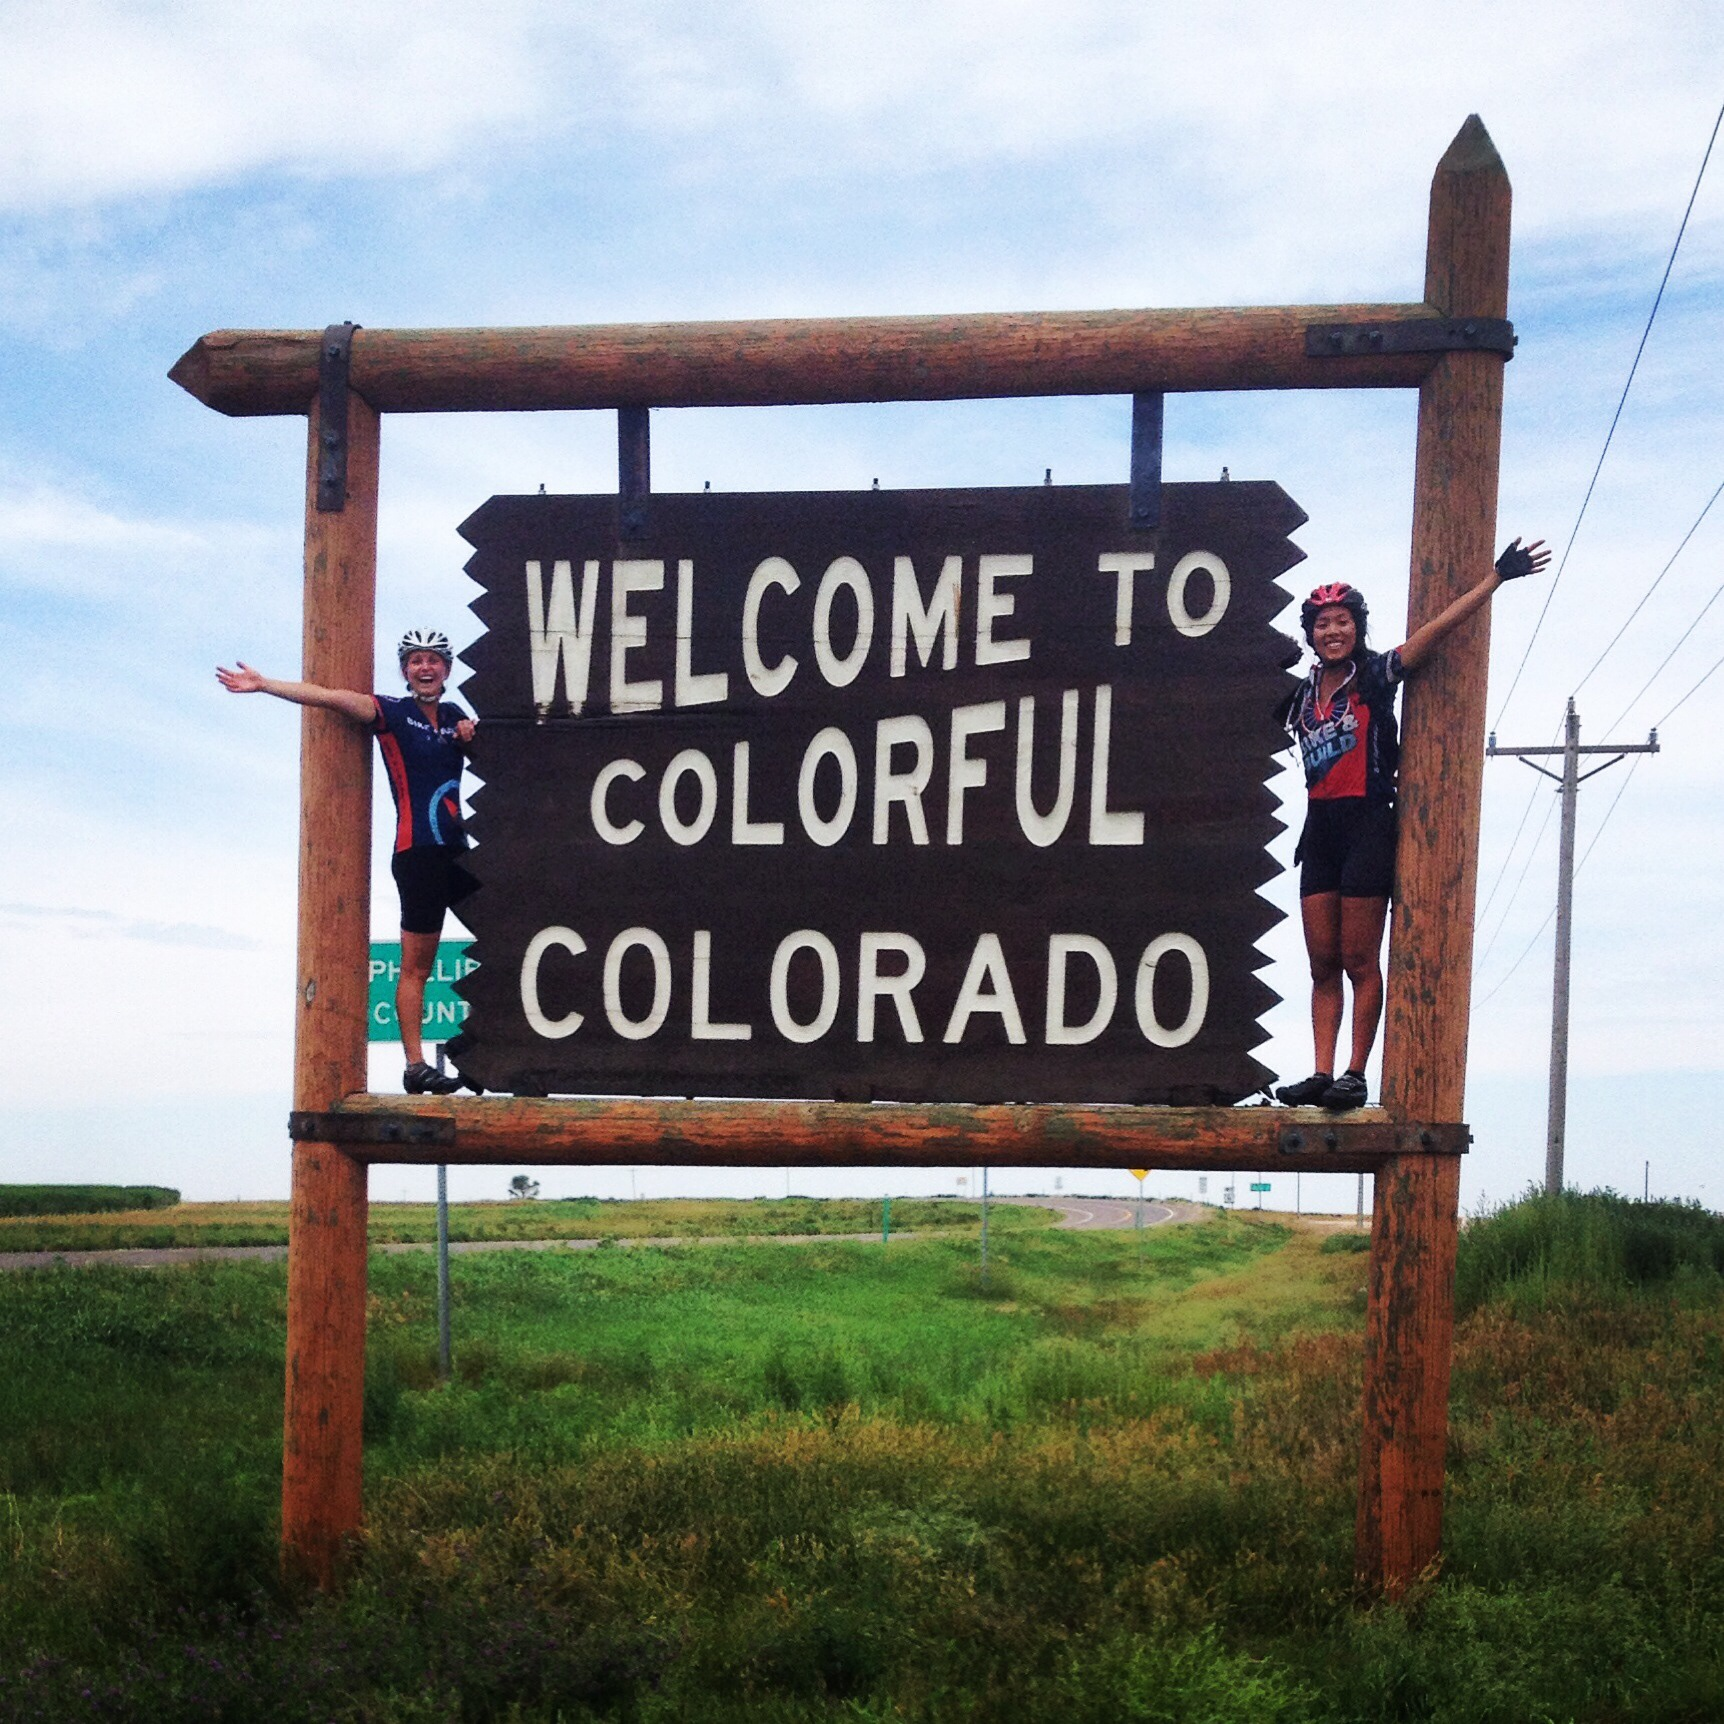 Rockies, we're coming for ya!